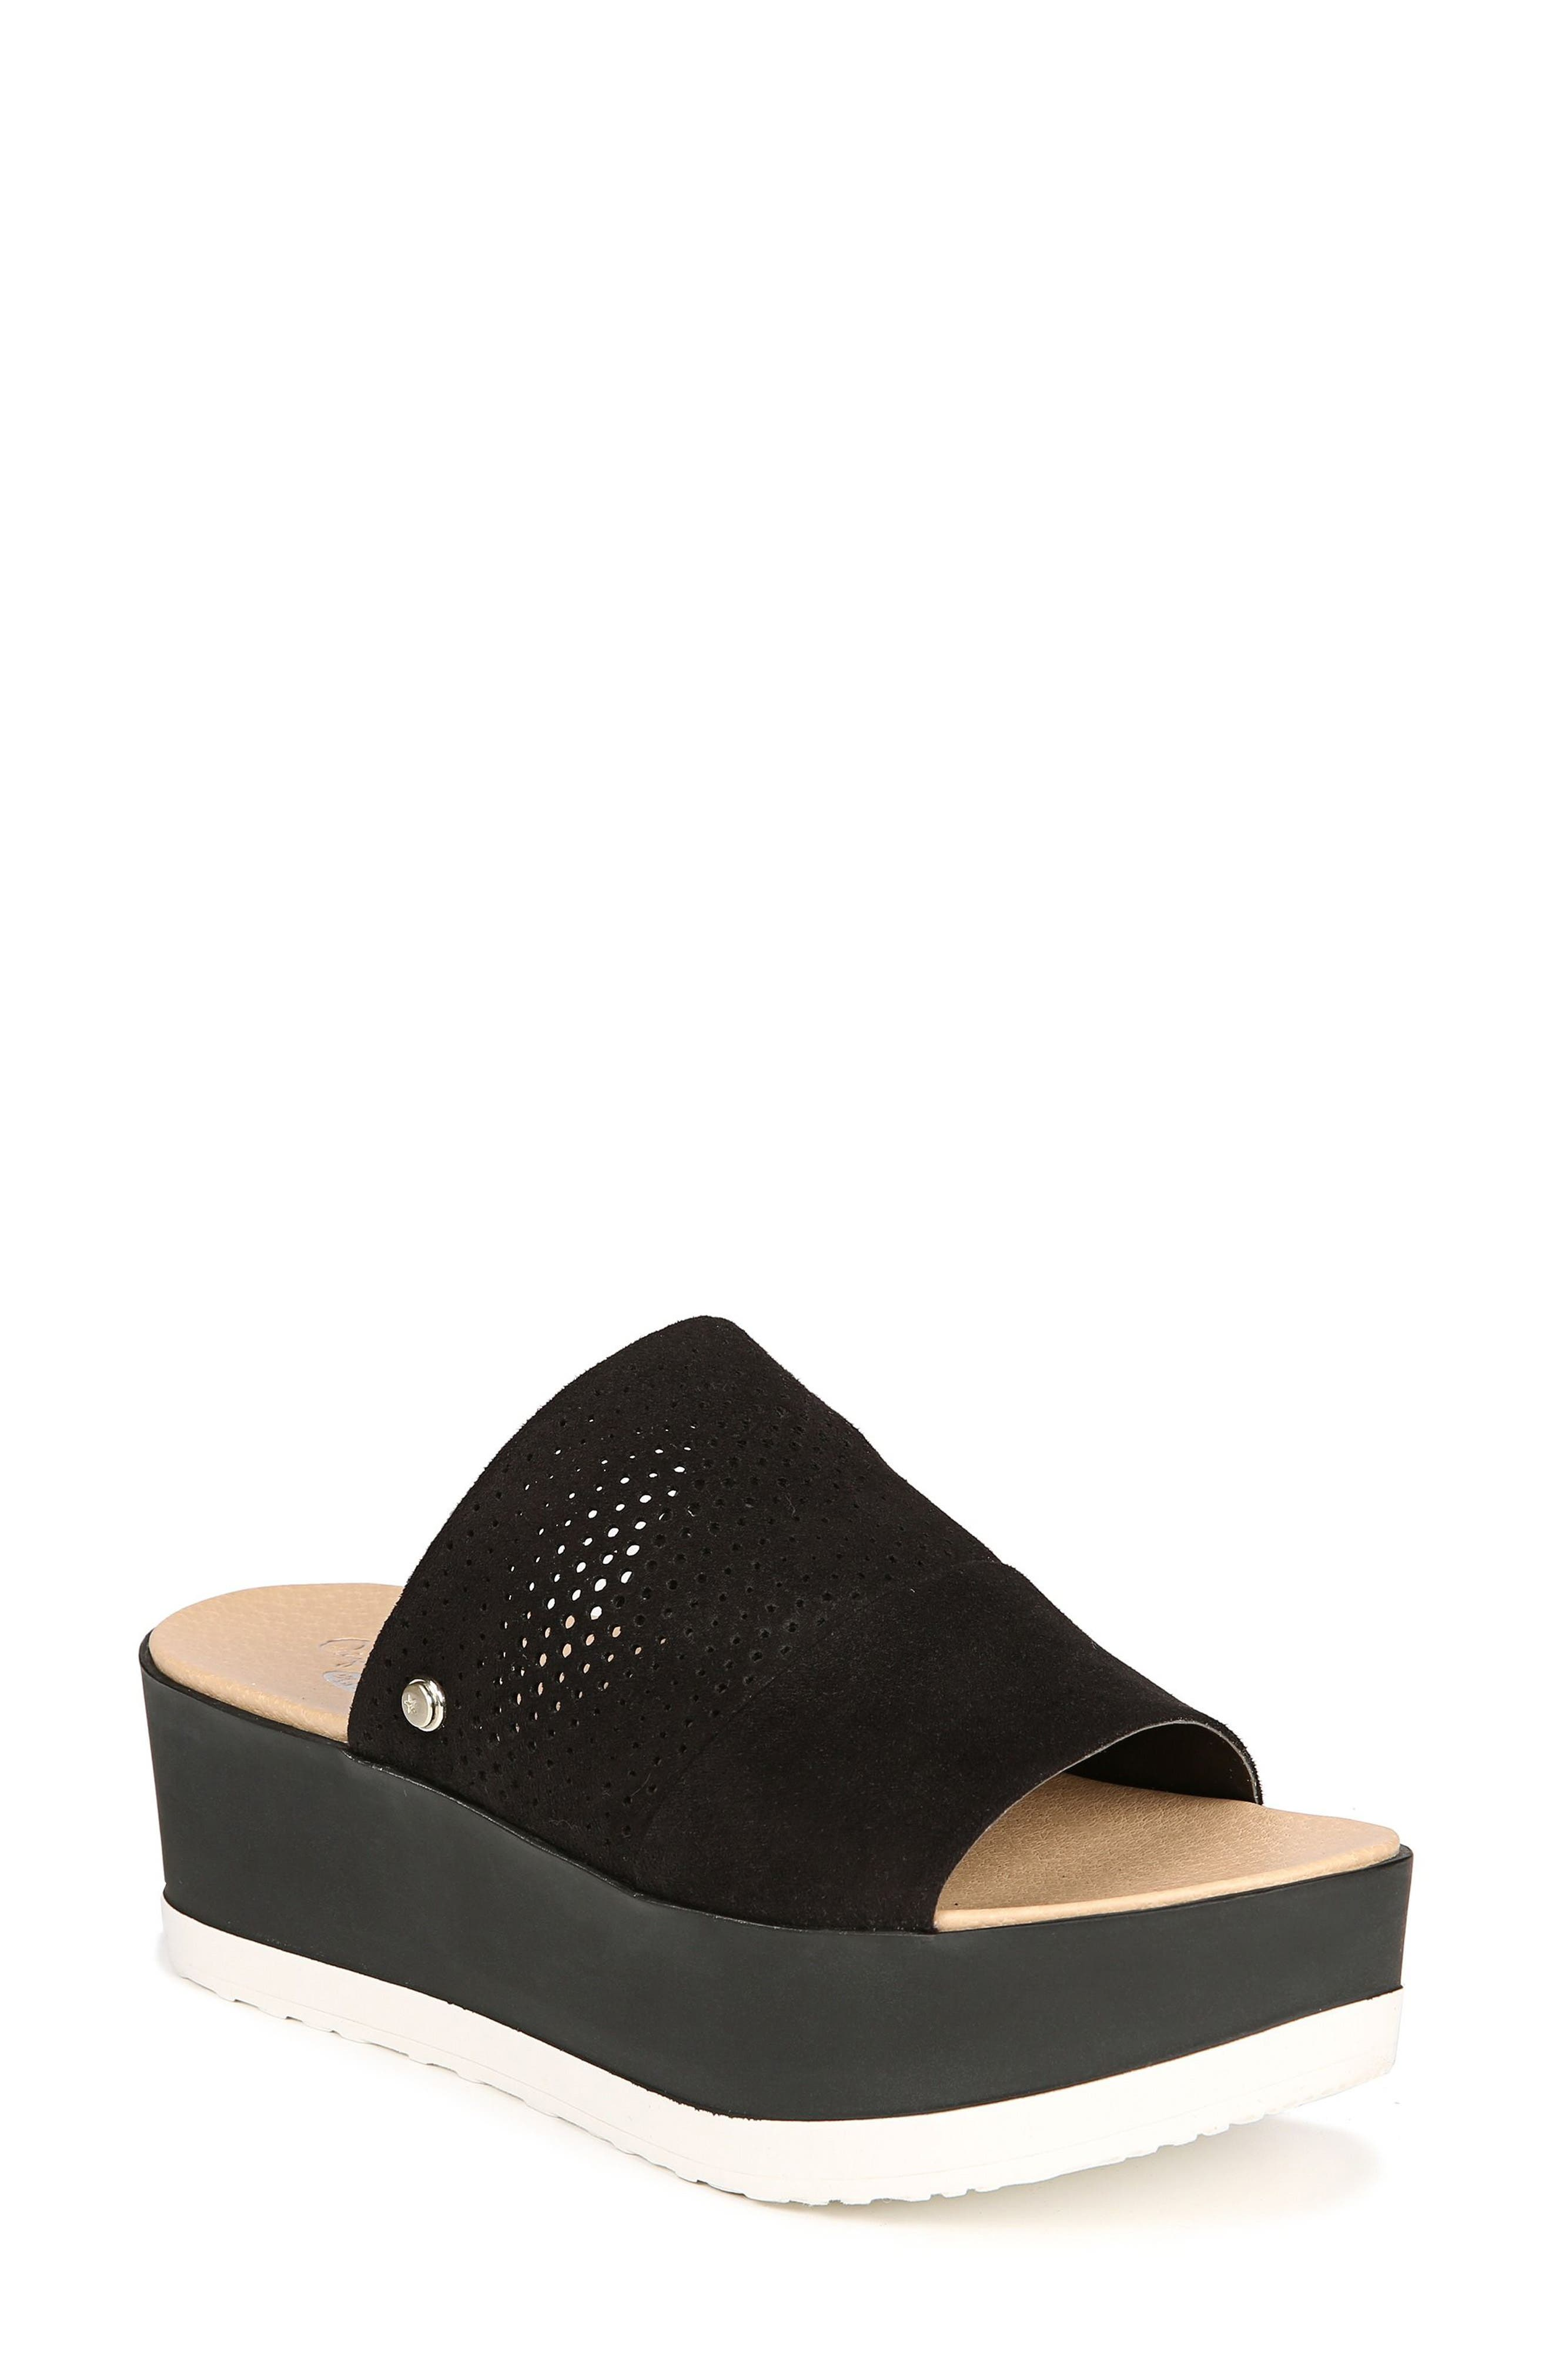 Dr. Scholl's Collins Platform Sandal (Women)